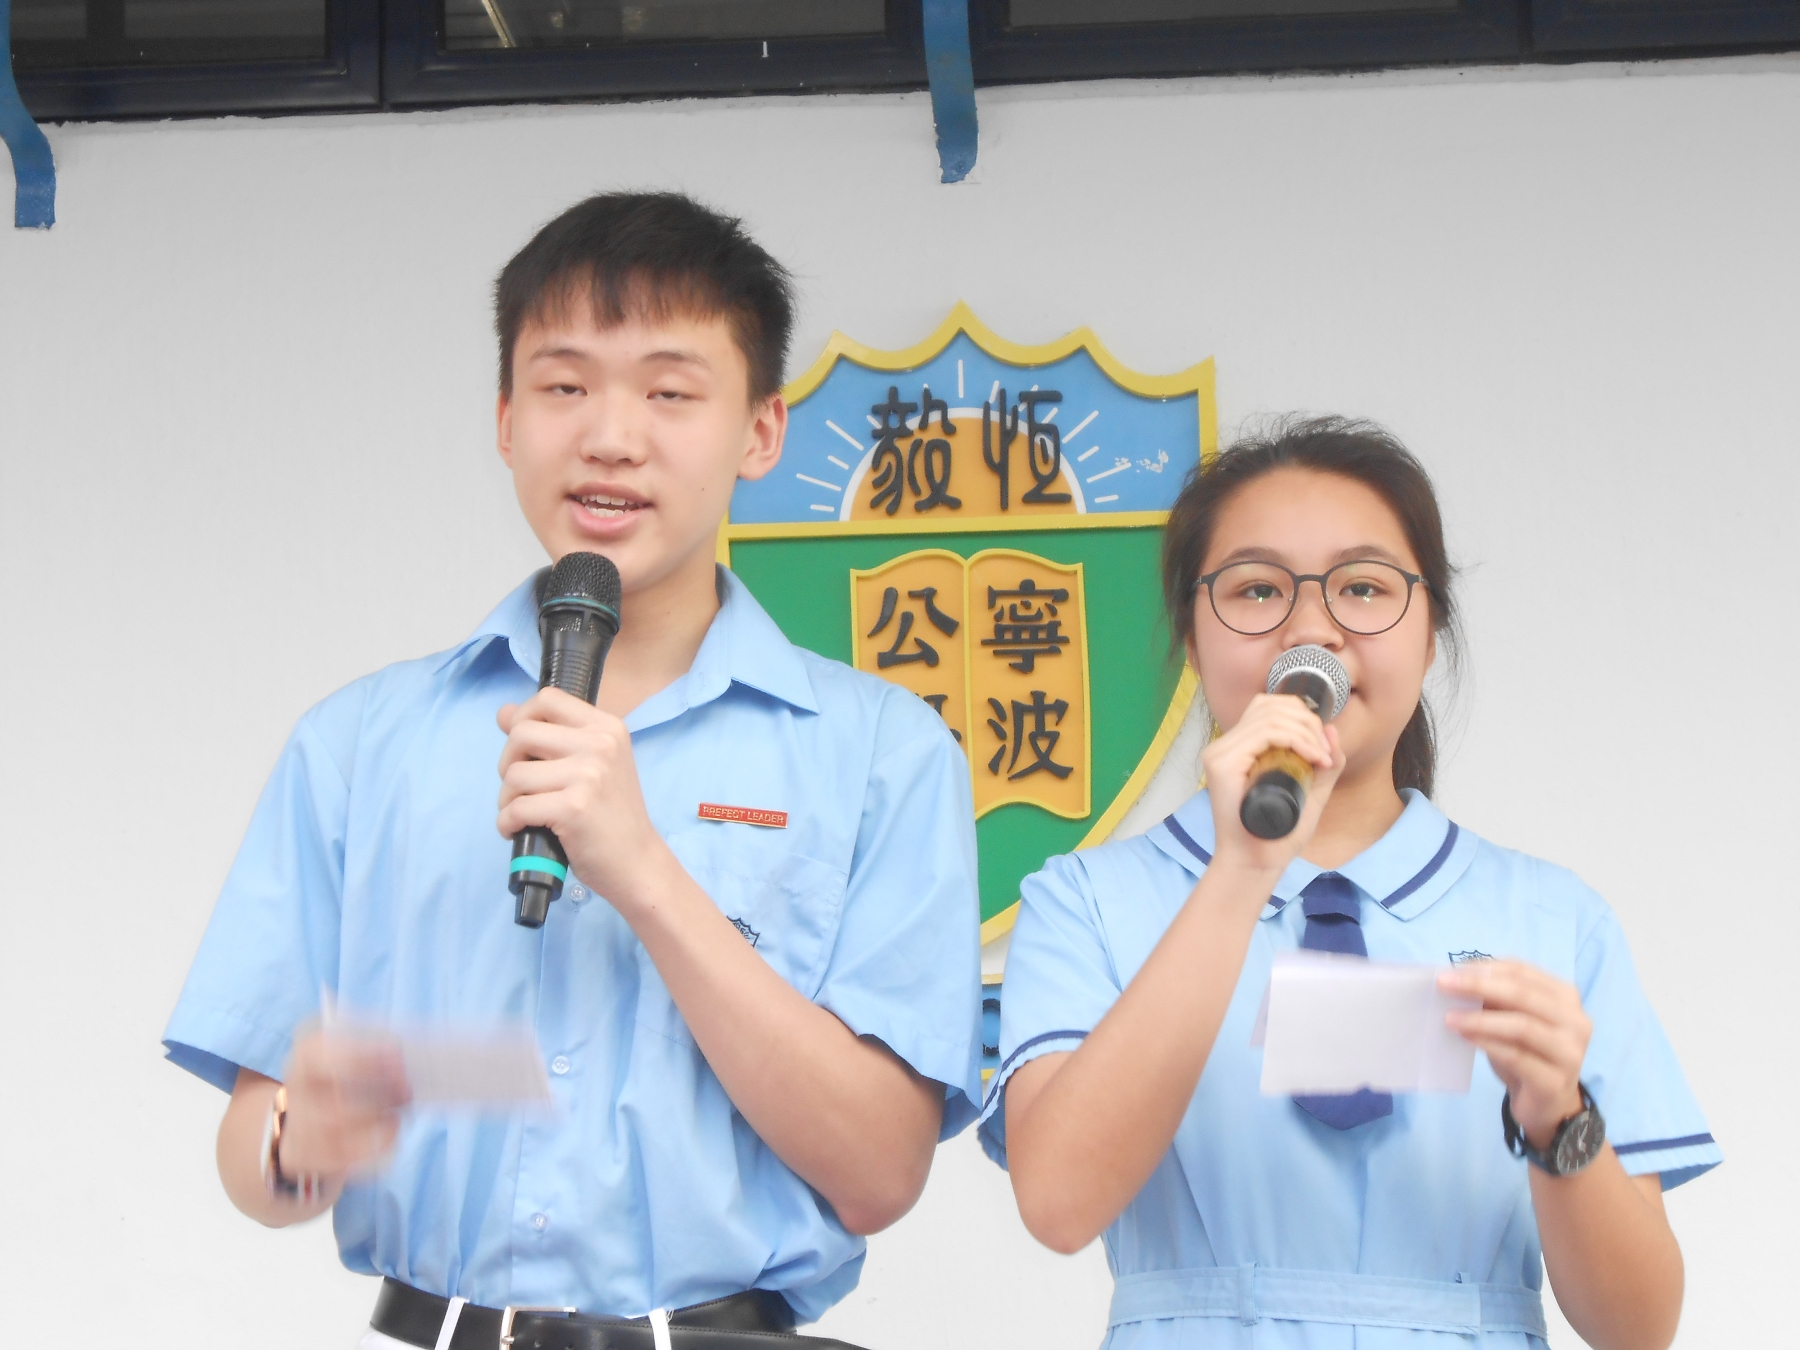 http://npc.edu.hk/sites/default/files/dscn8990.jpg